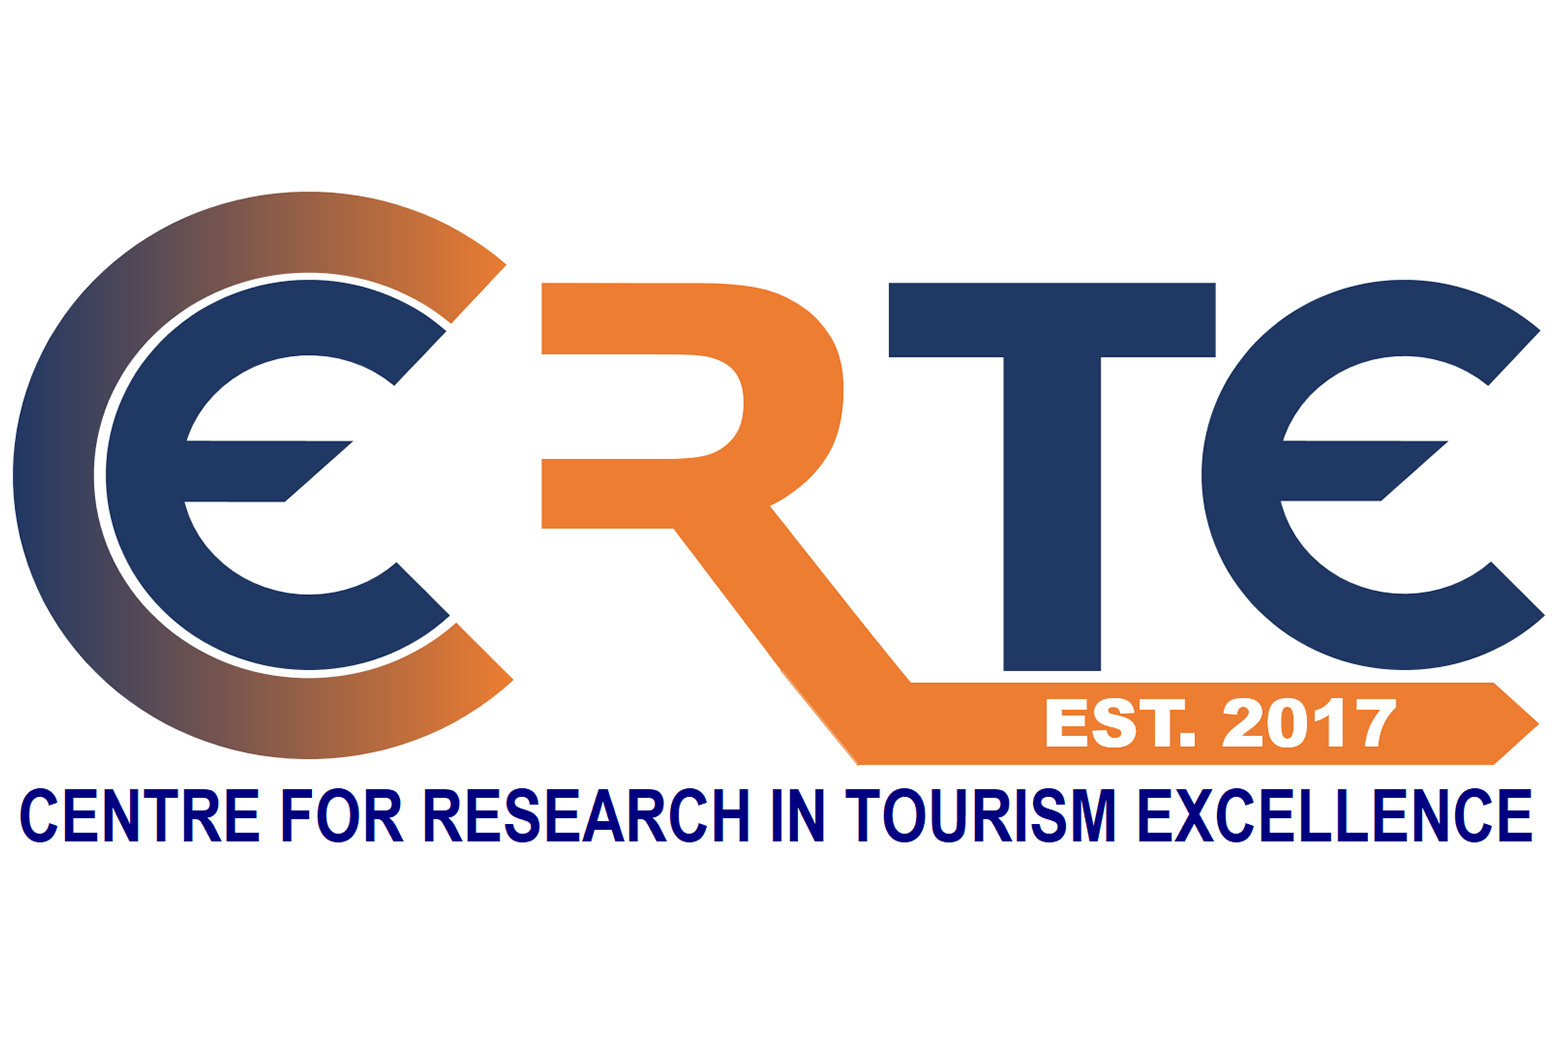 The official logo of CERTE